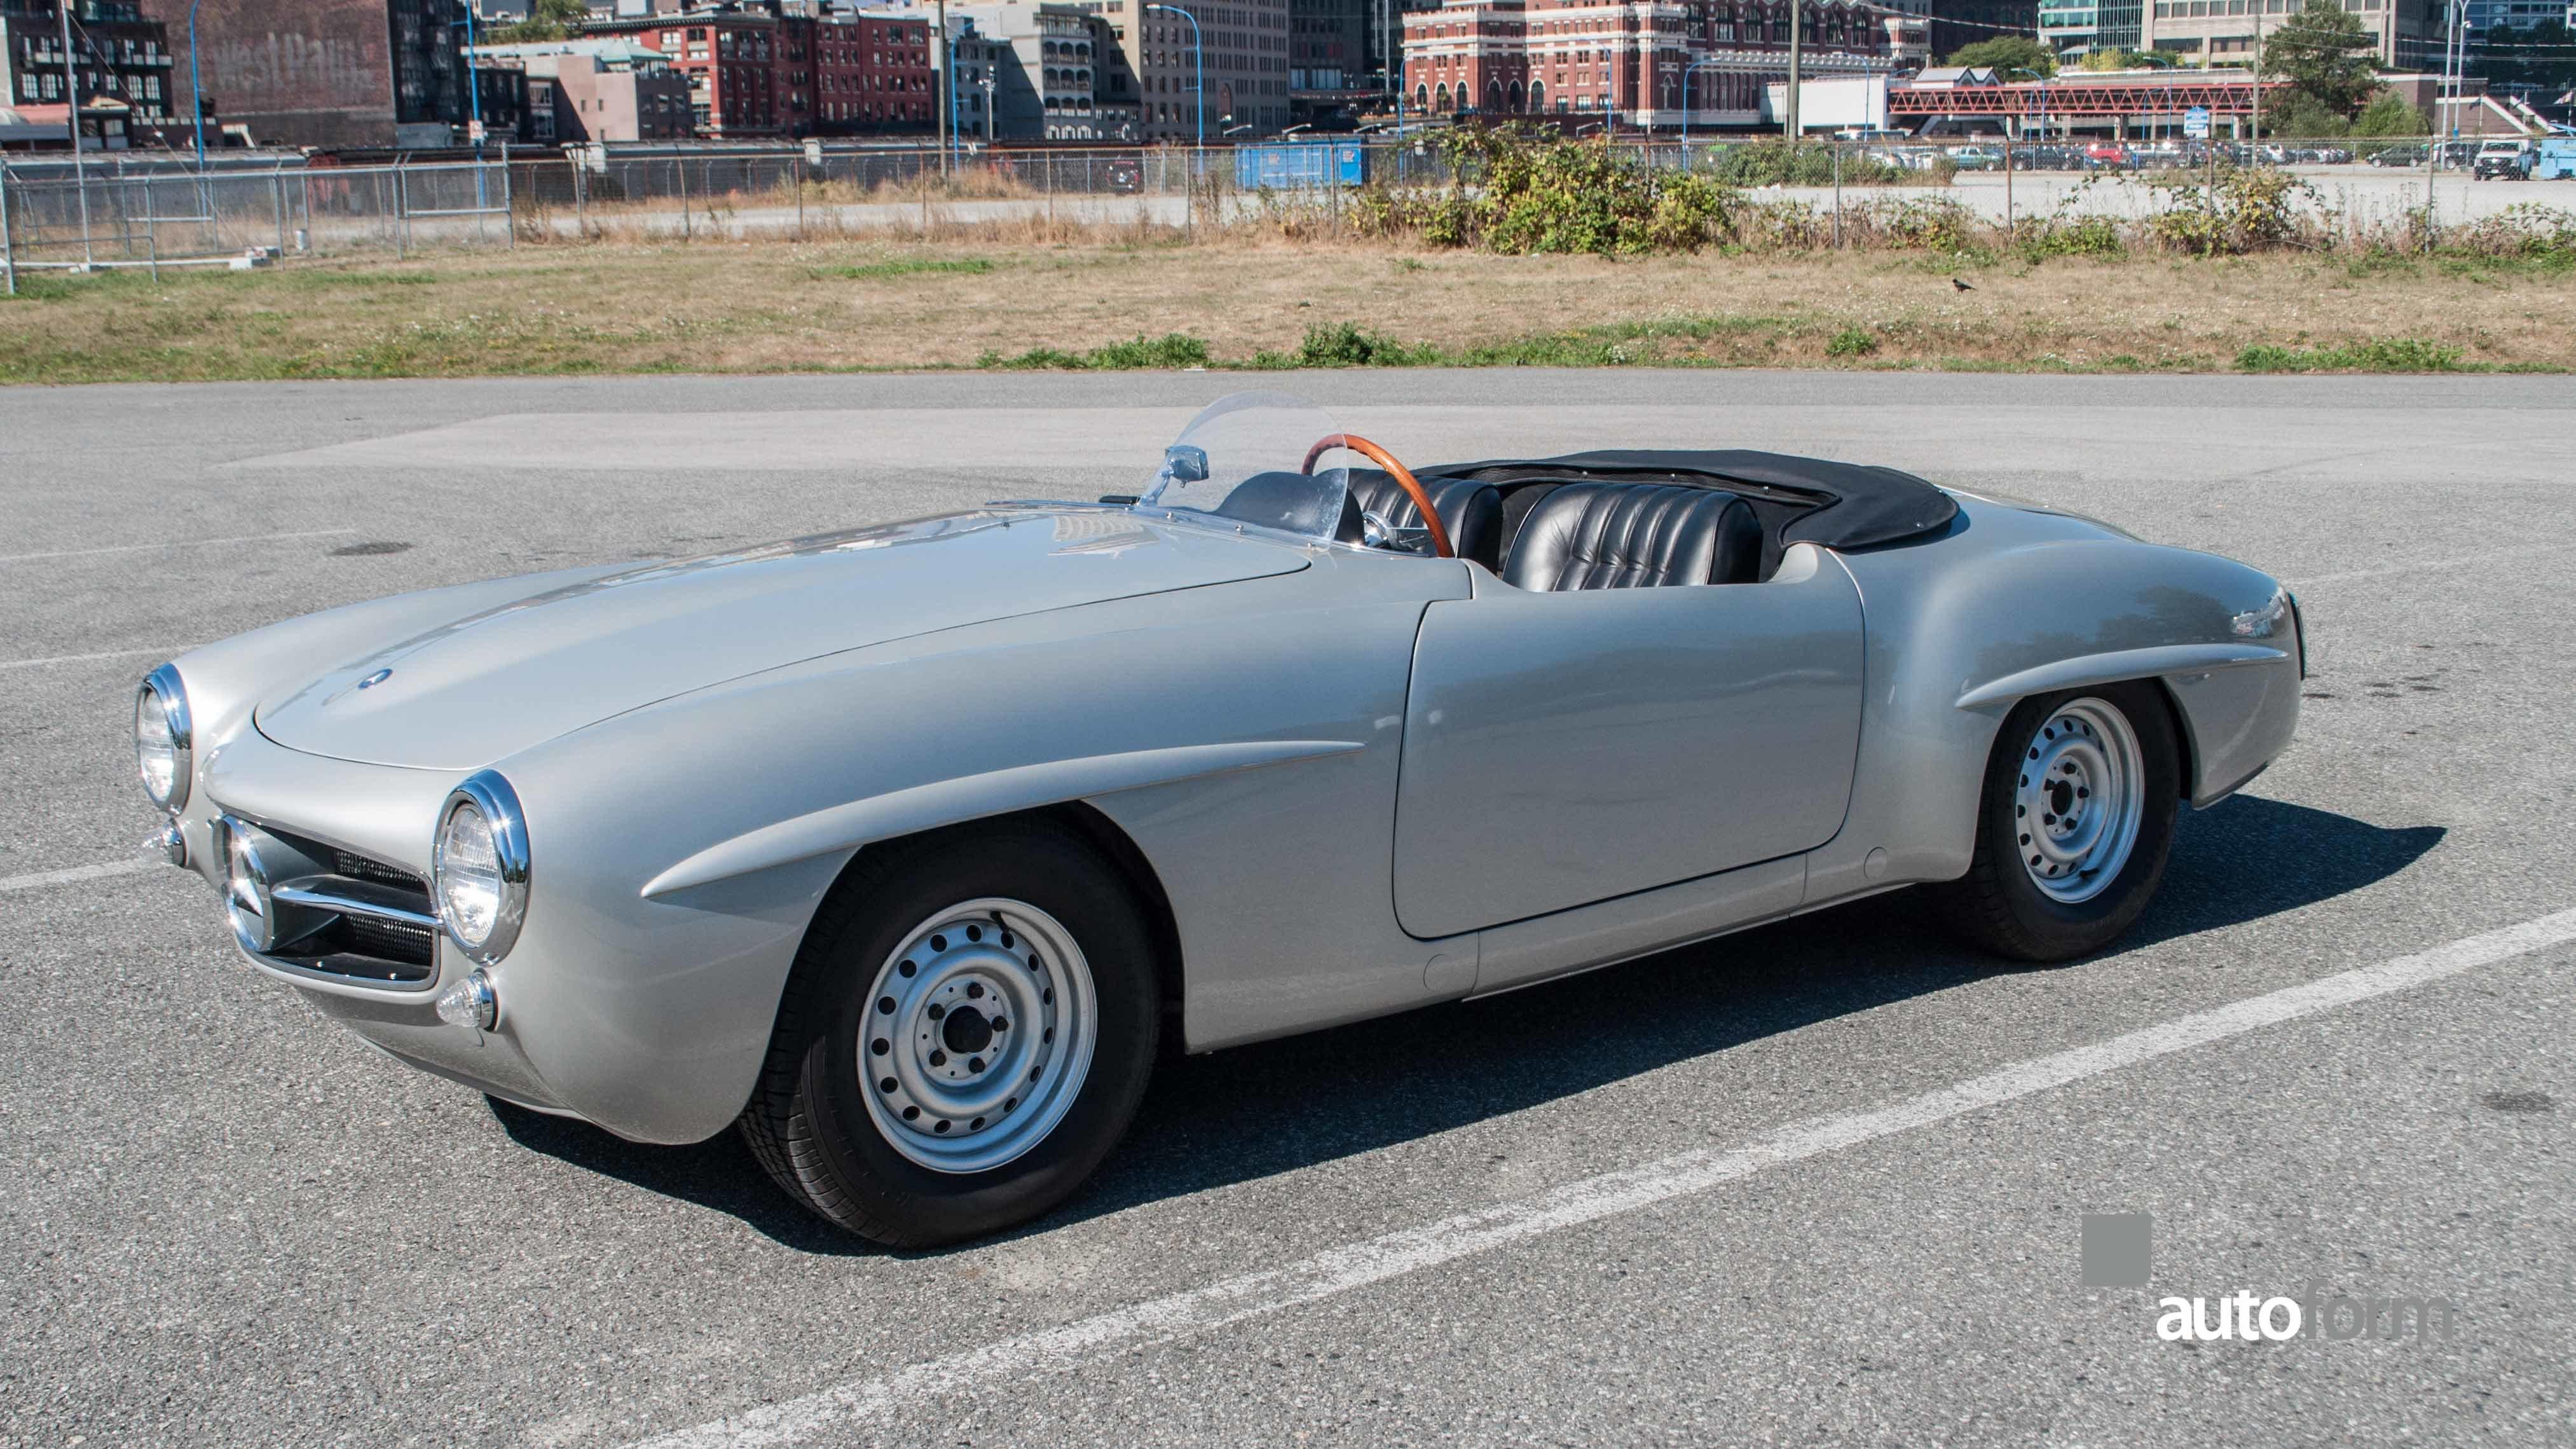 1963 mercedes benz 190 slr autoform for 1963 mercedes benz